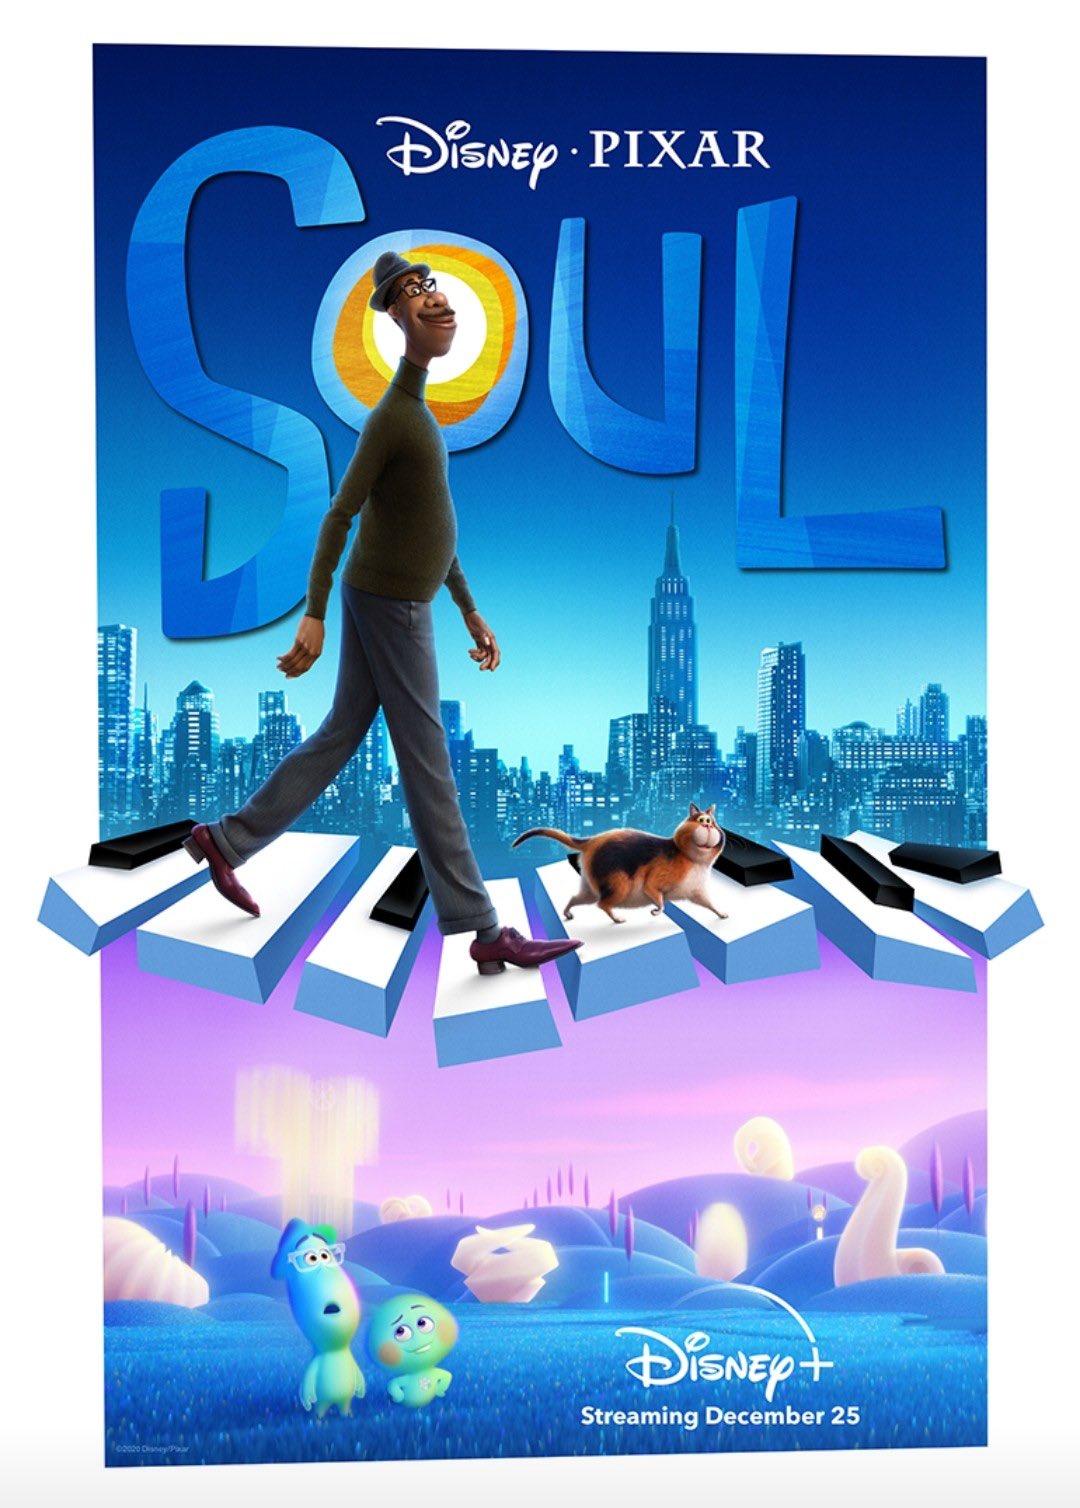 Pixar's movie Soul